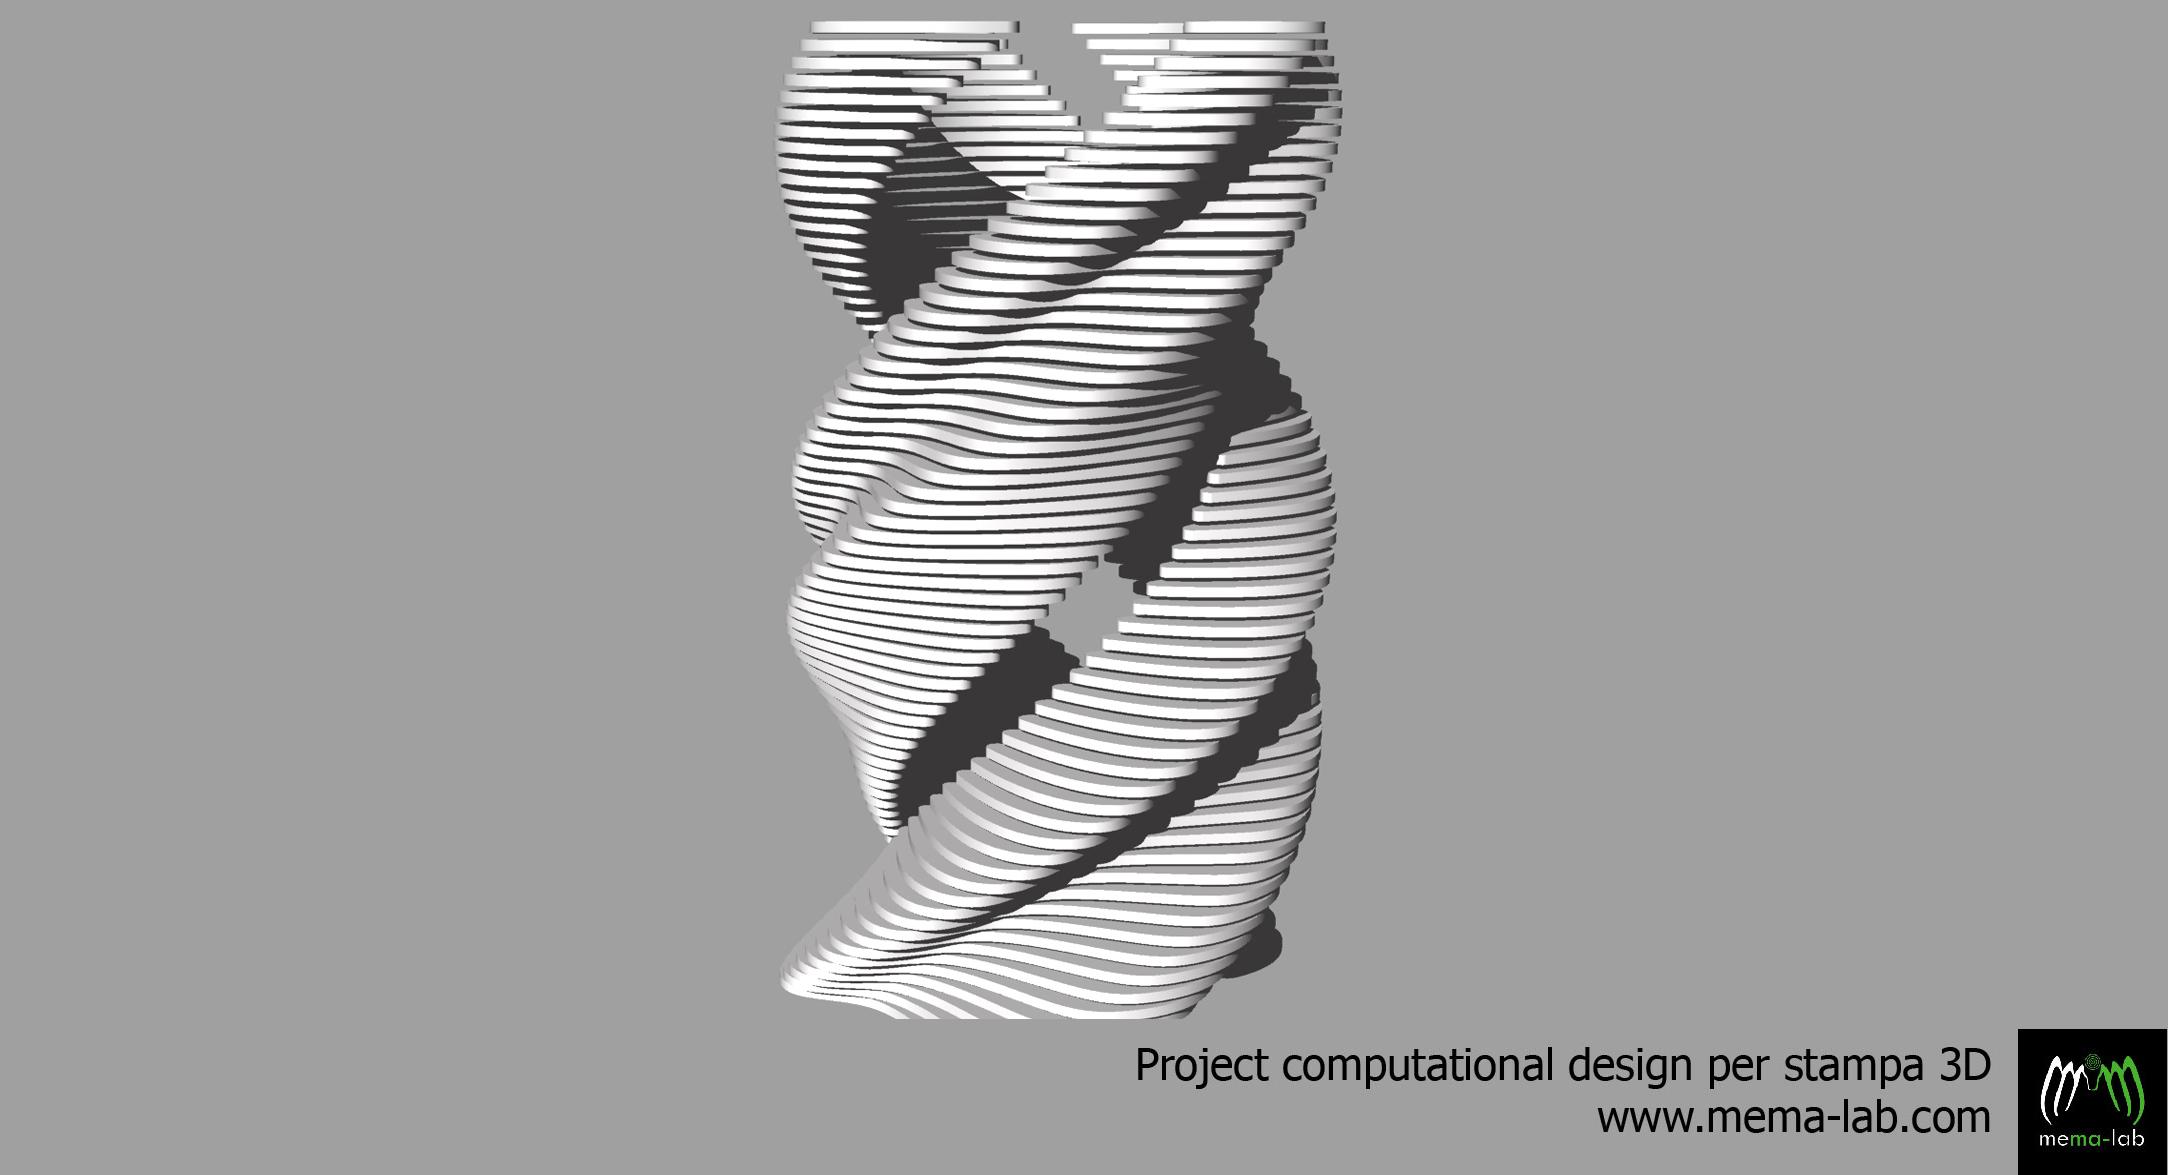 Studio forma modello 3D  MeMa Lab